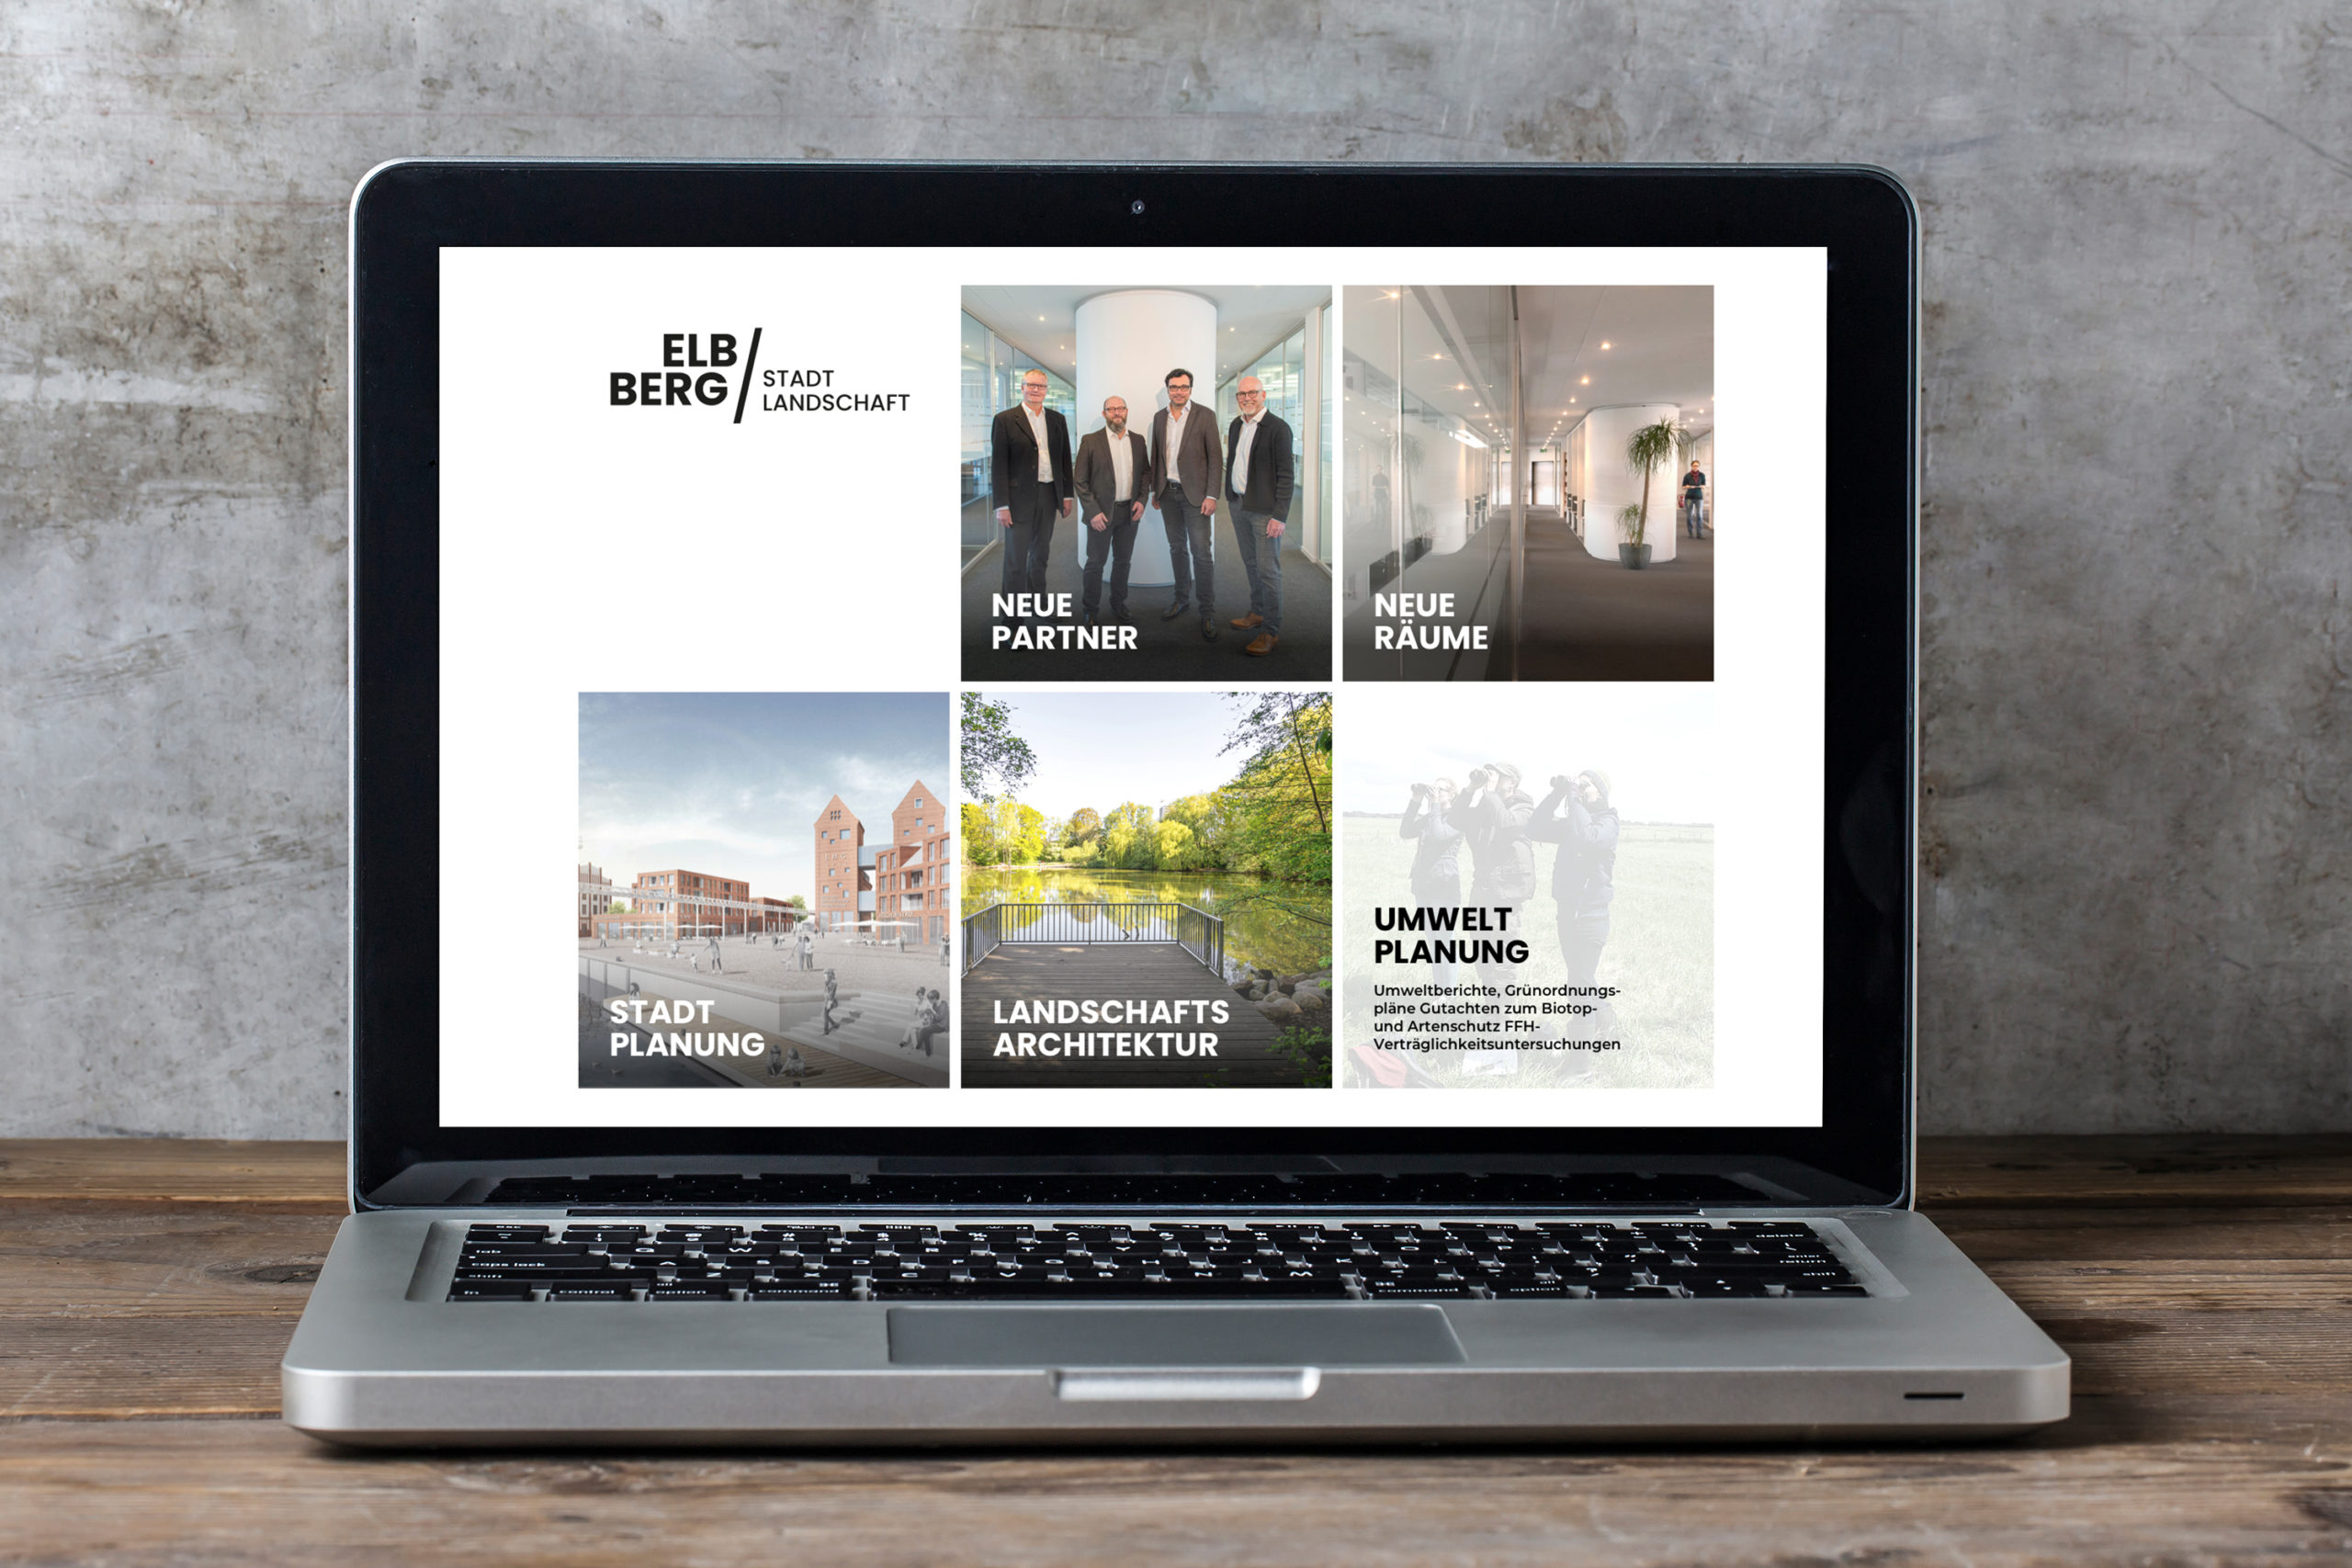 ELBBERG Standlandschaft l Stadt- und Landschaftsplanung l Webdesign